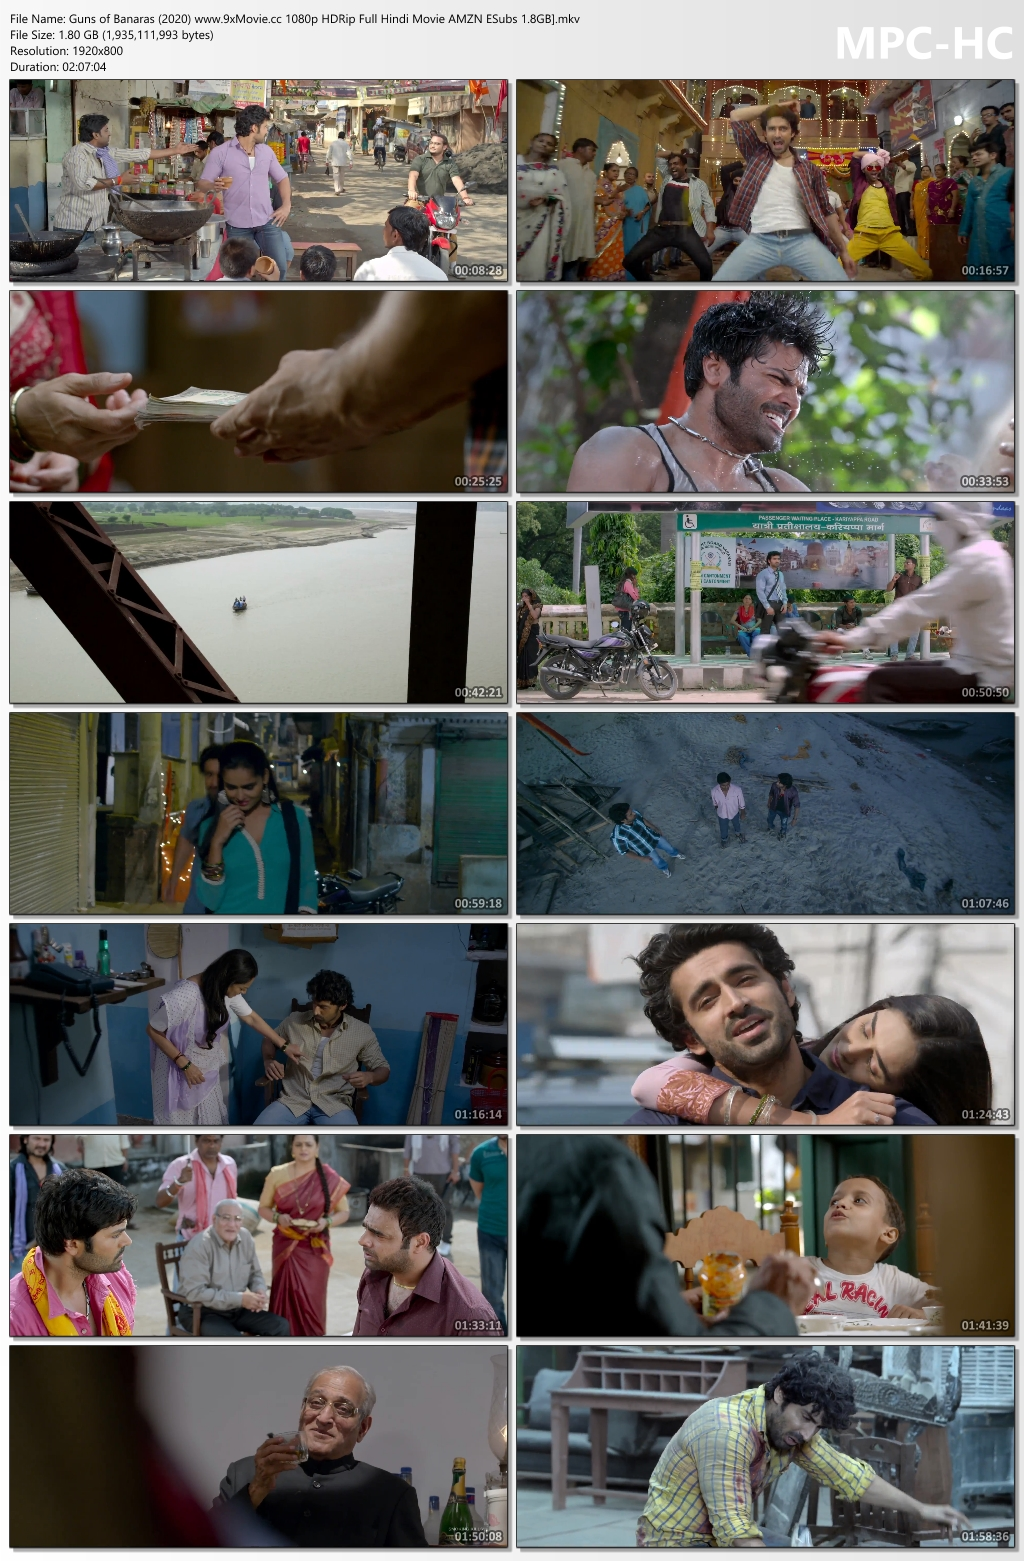 Guns-of-Banaras-2020-www-9x-Movie-cc-1080p-HDRip-Full-Hindi-Movie-AMZN-ESubs-1-8-GB-mkv